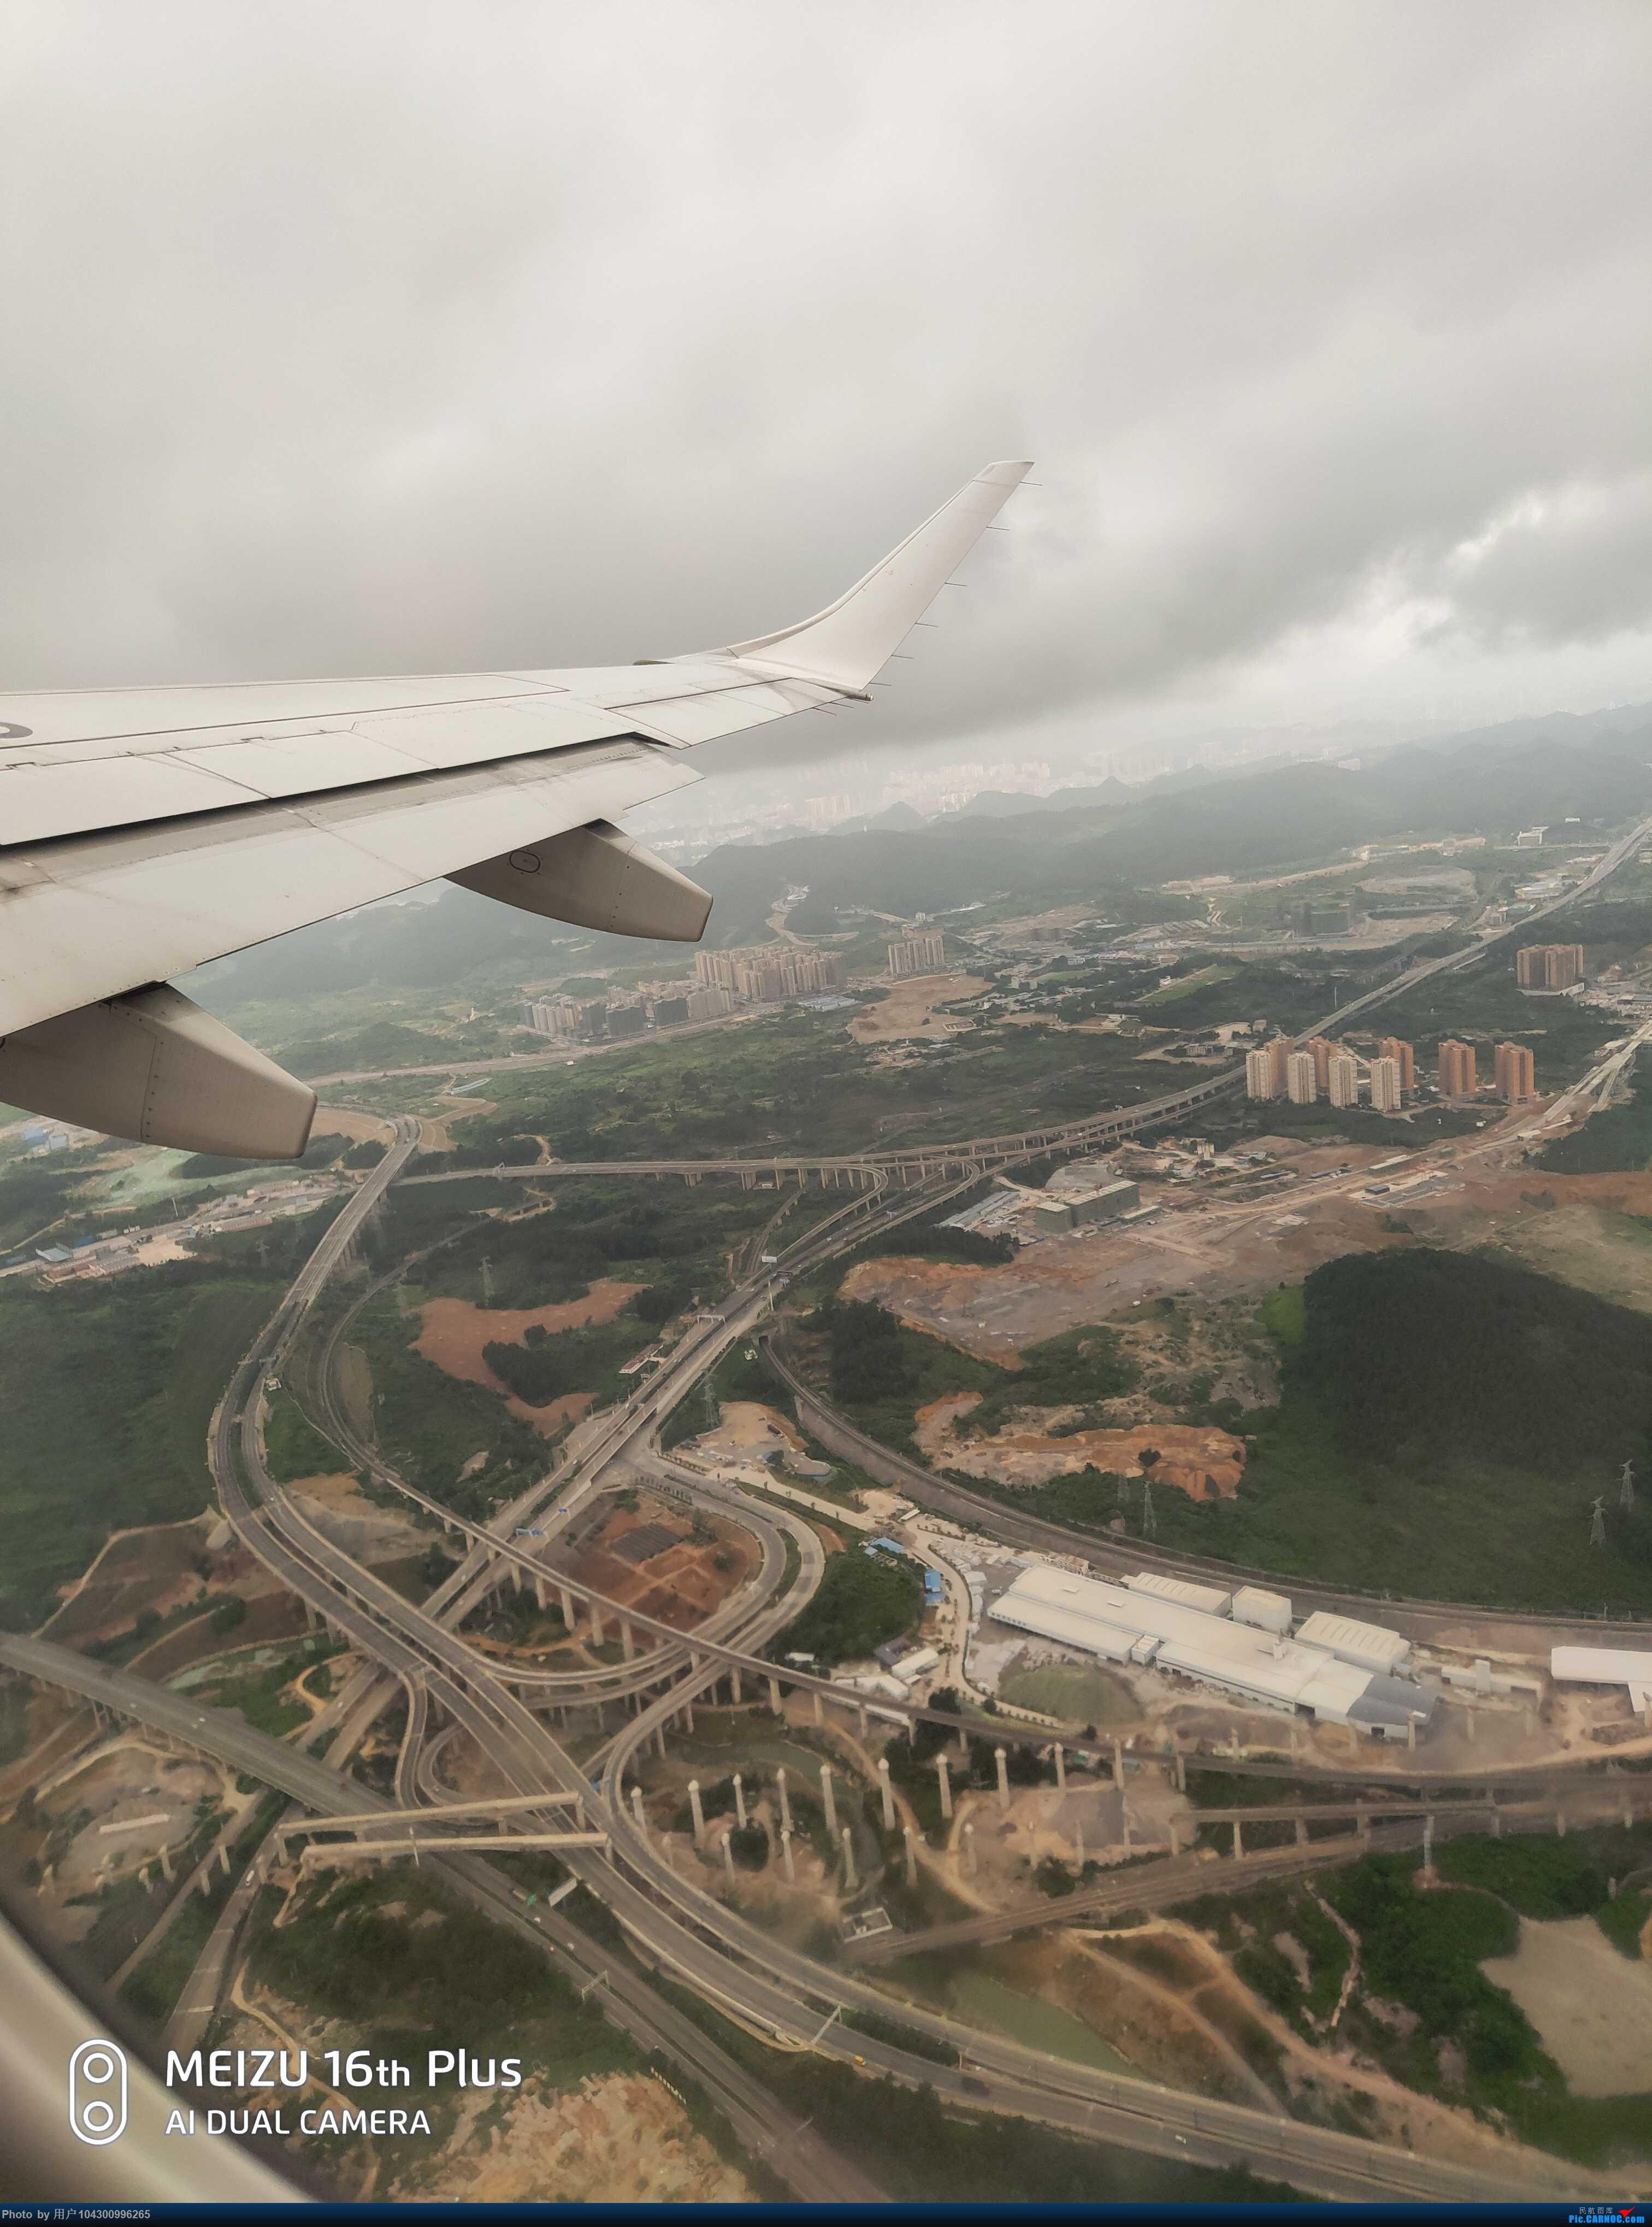 Re:[原创][DM哥飞行游记]-多彩贵州航空贵阳-茅台当日往返    中国贵阳龙洞堡国际机场